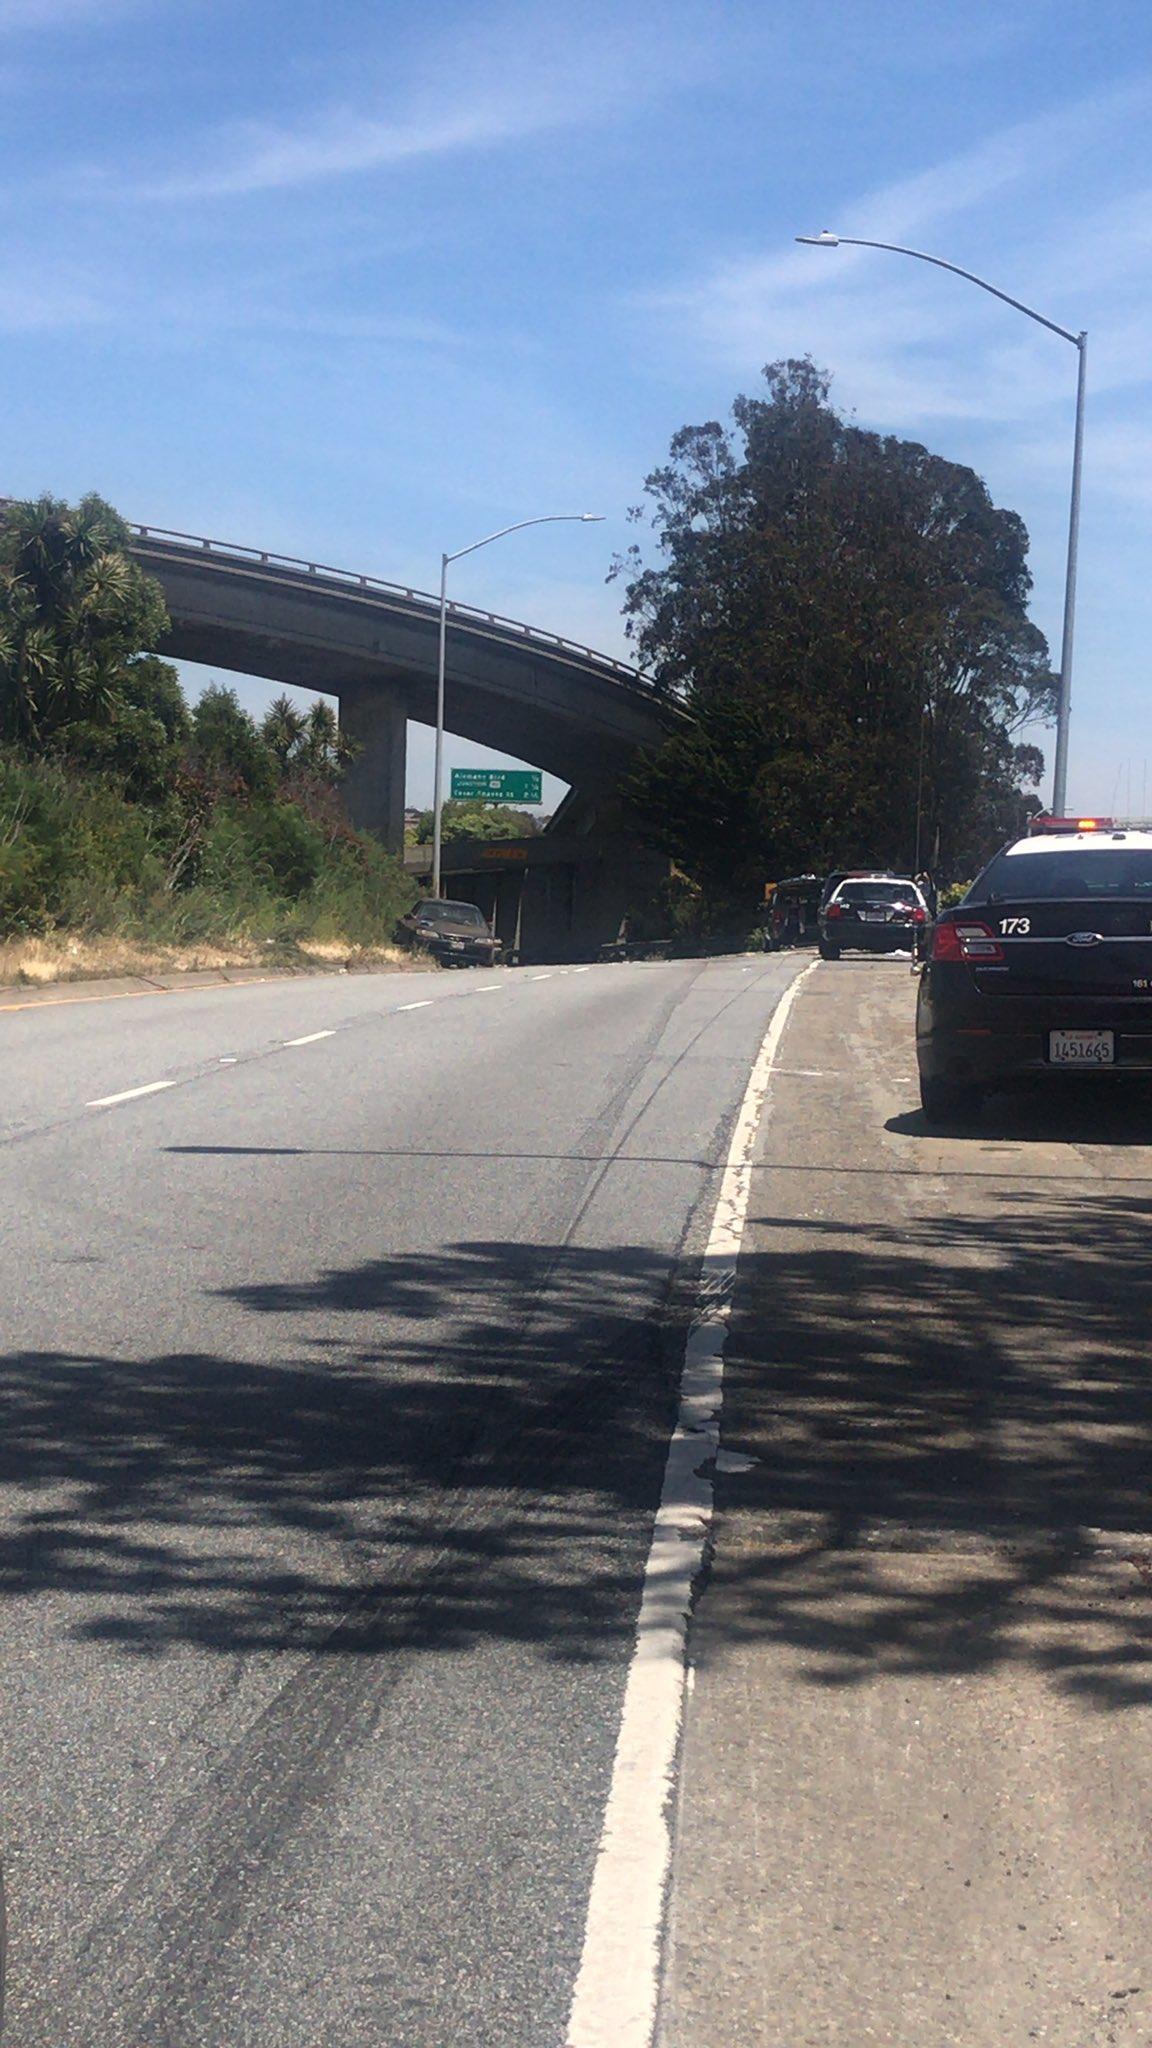 2 shot on I-280 in San Francisco